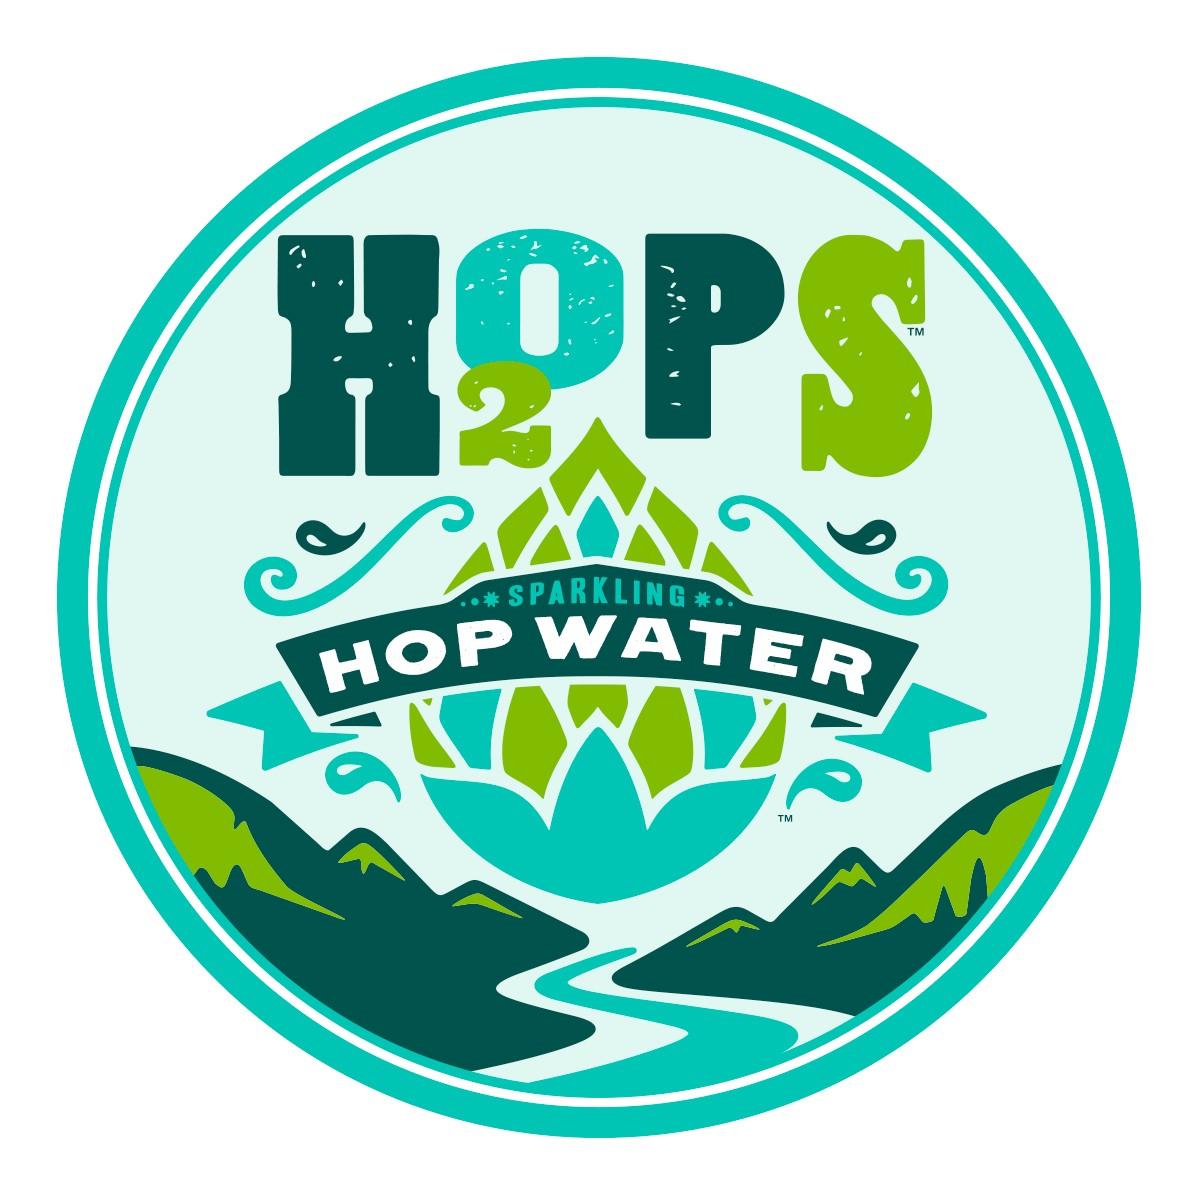 H2OPS - The Original Craft Brewed Hop Water